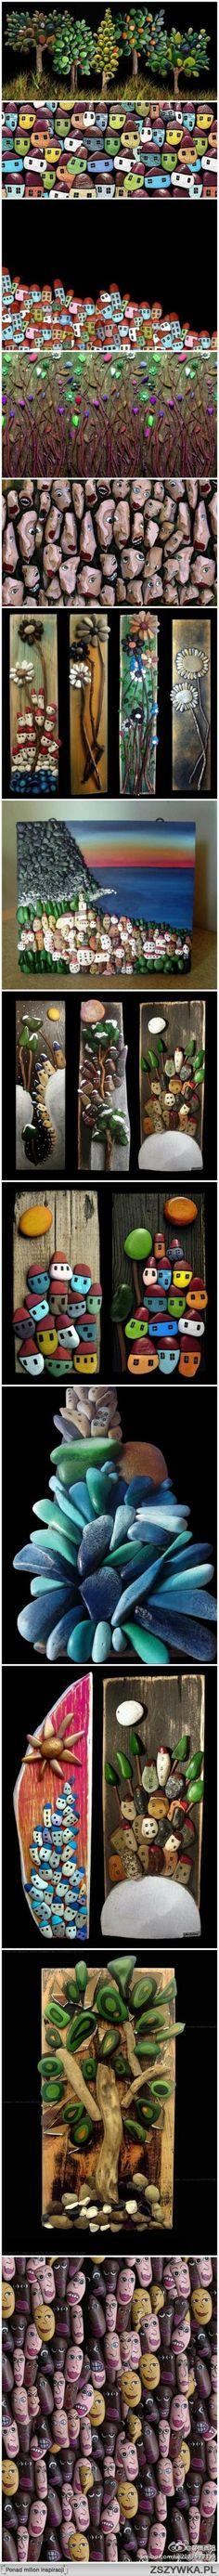 Pretty cool combinations. z-kamieni.jpg